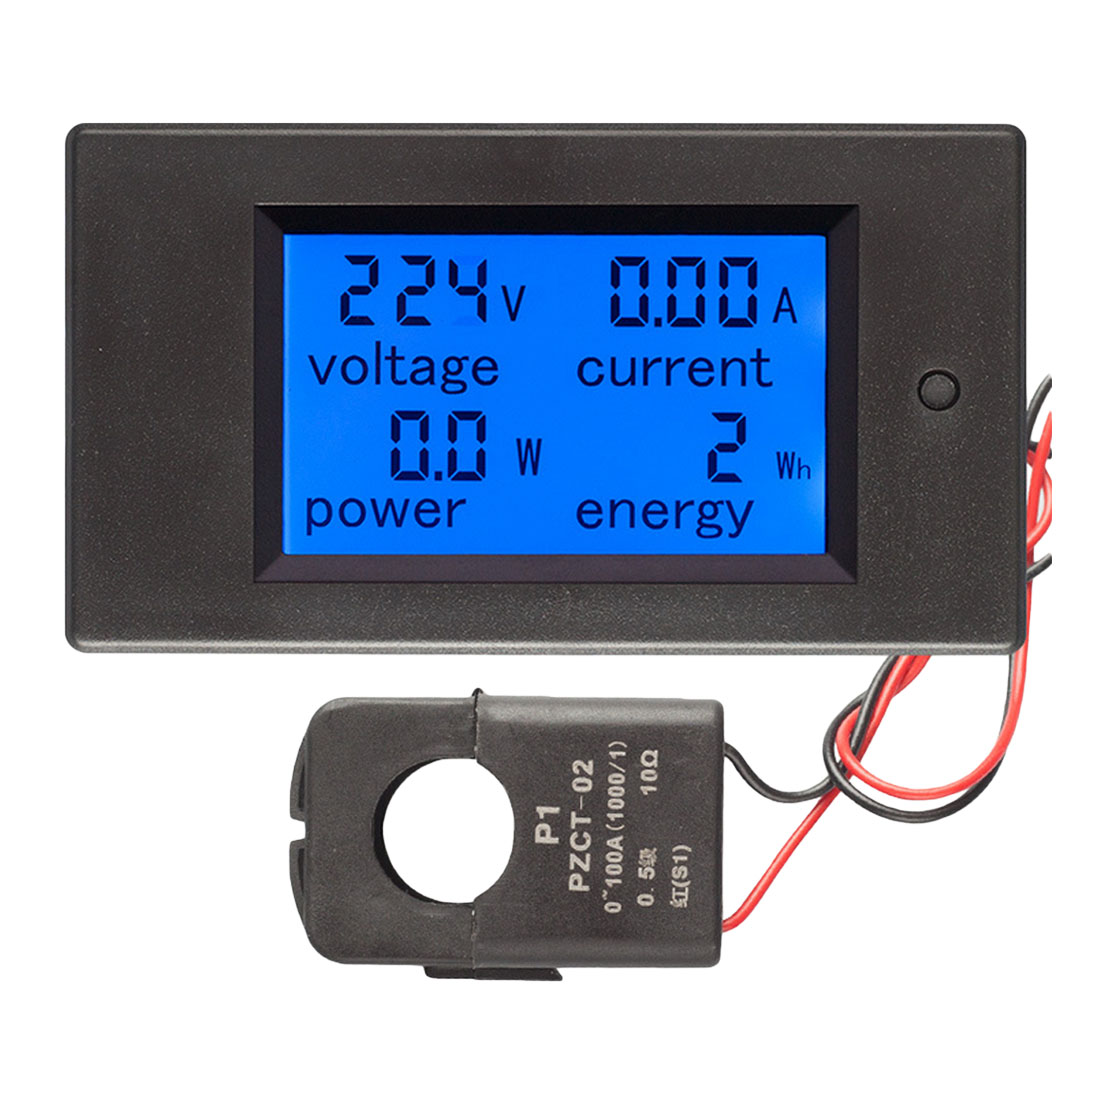 AC Voltage Meters Power Energy Voltmeter Ammeter Watt Current Amps Volt Meter LCD Panel Monitor 100A/80~260V Digital